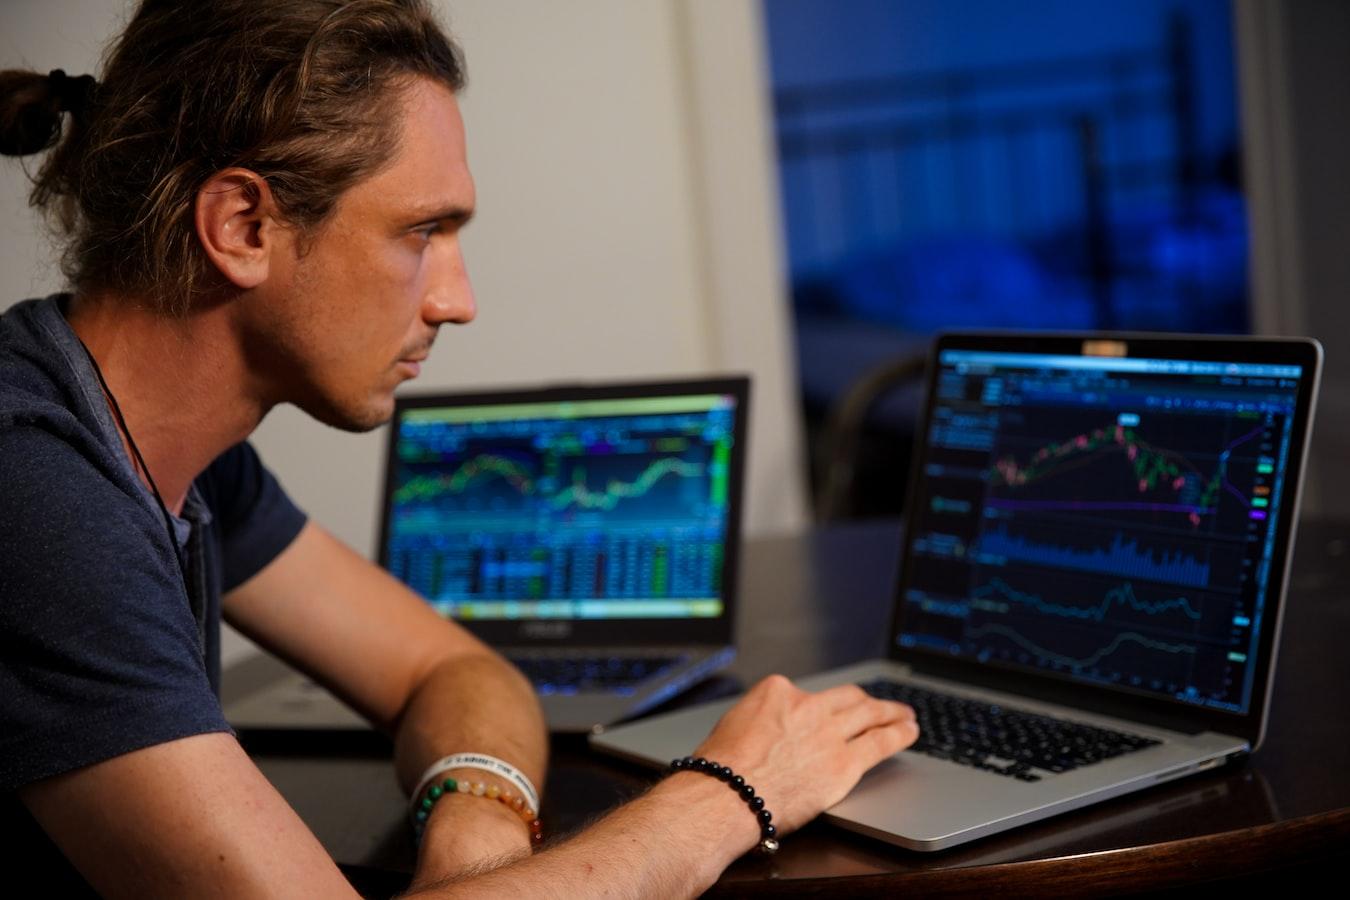 Tecniche di trading: medie mobili